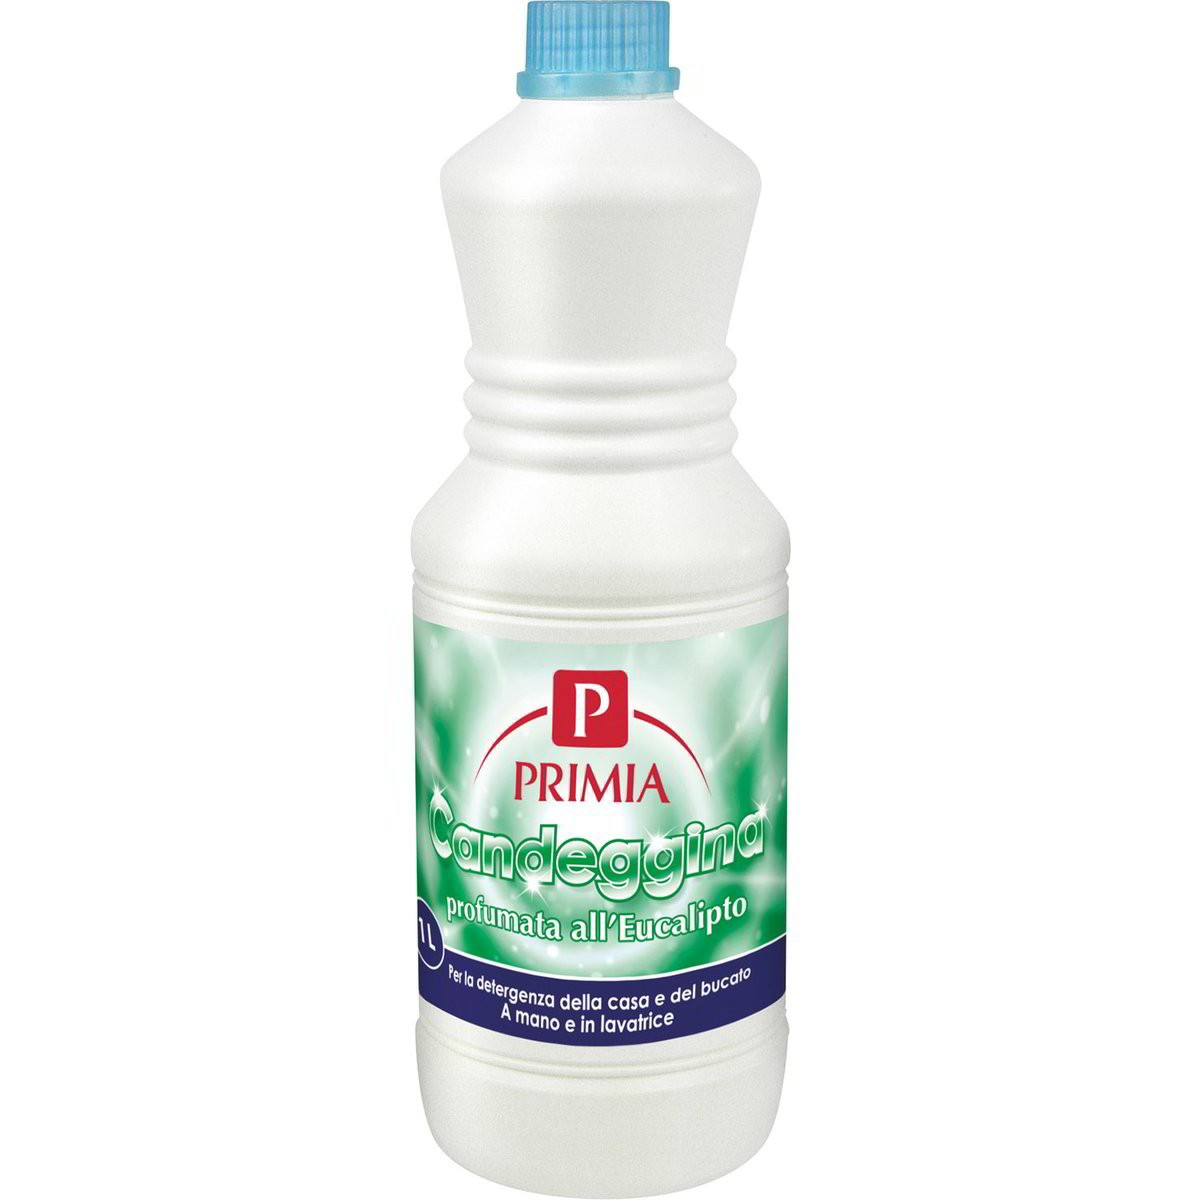 Primia Candeggina profumata